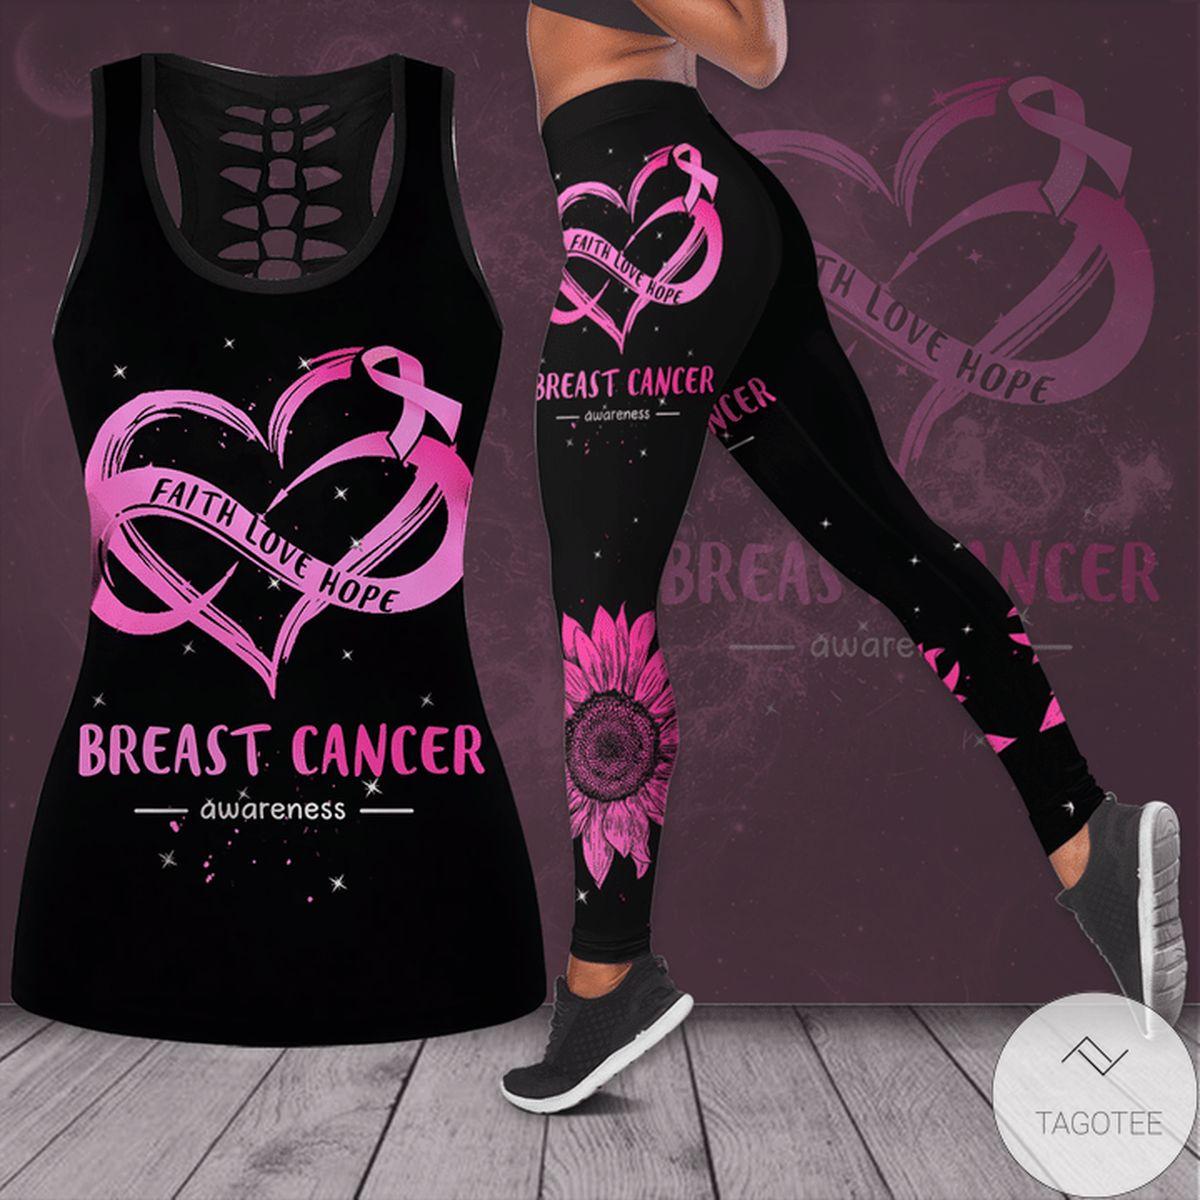 Breast Cancer Awareness Faith Love Hope Hollow Tank Top & Leggings Set